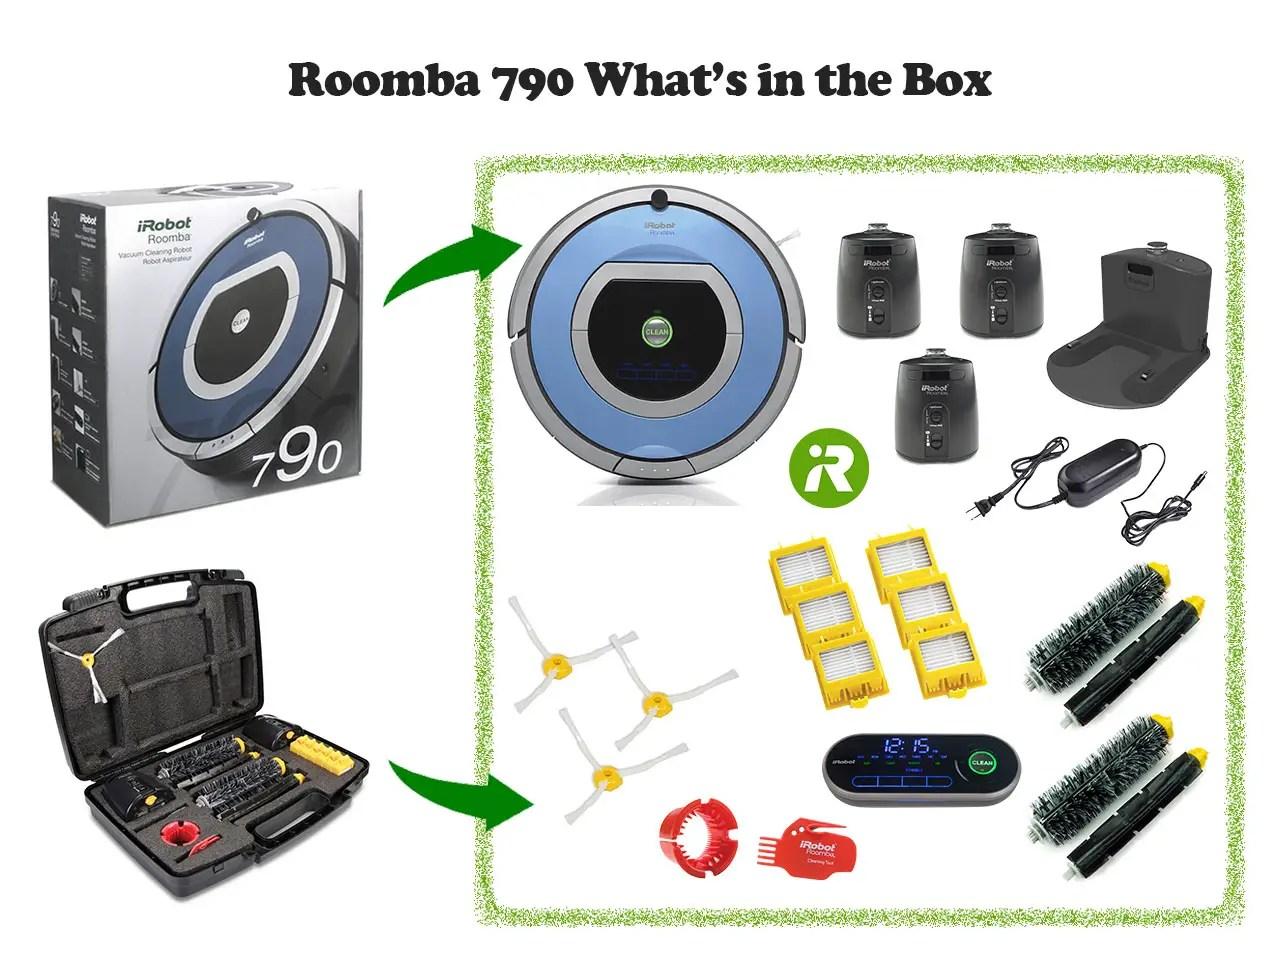 Roomba 790 in box